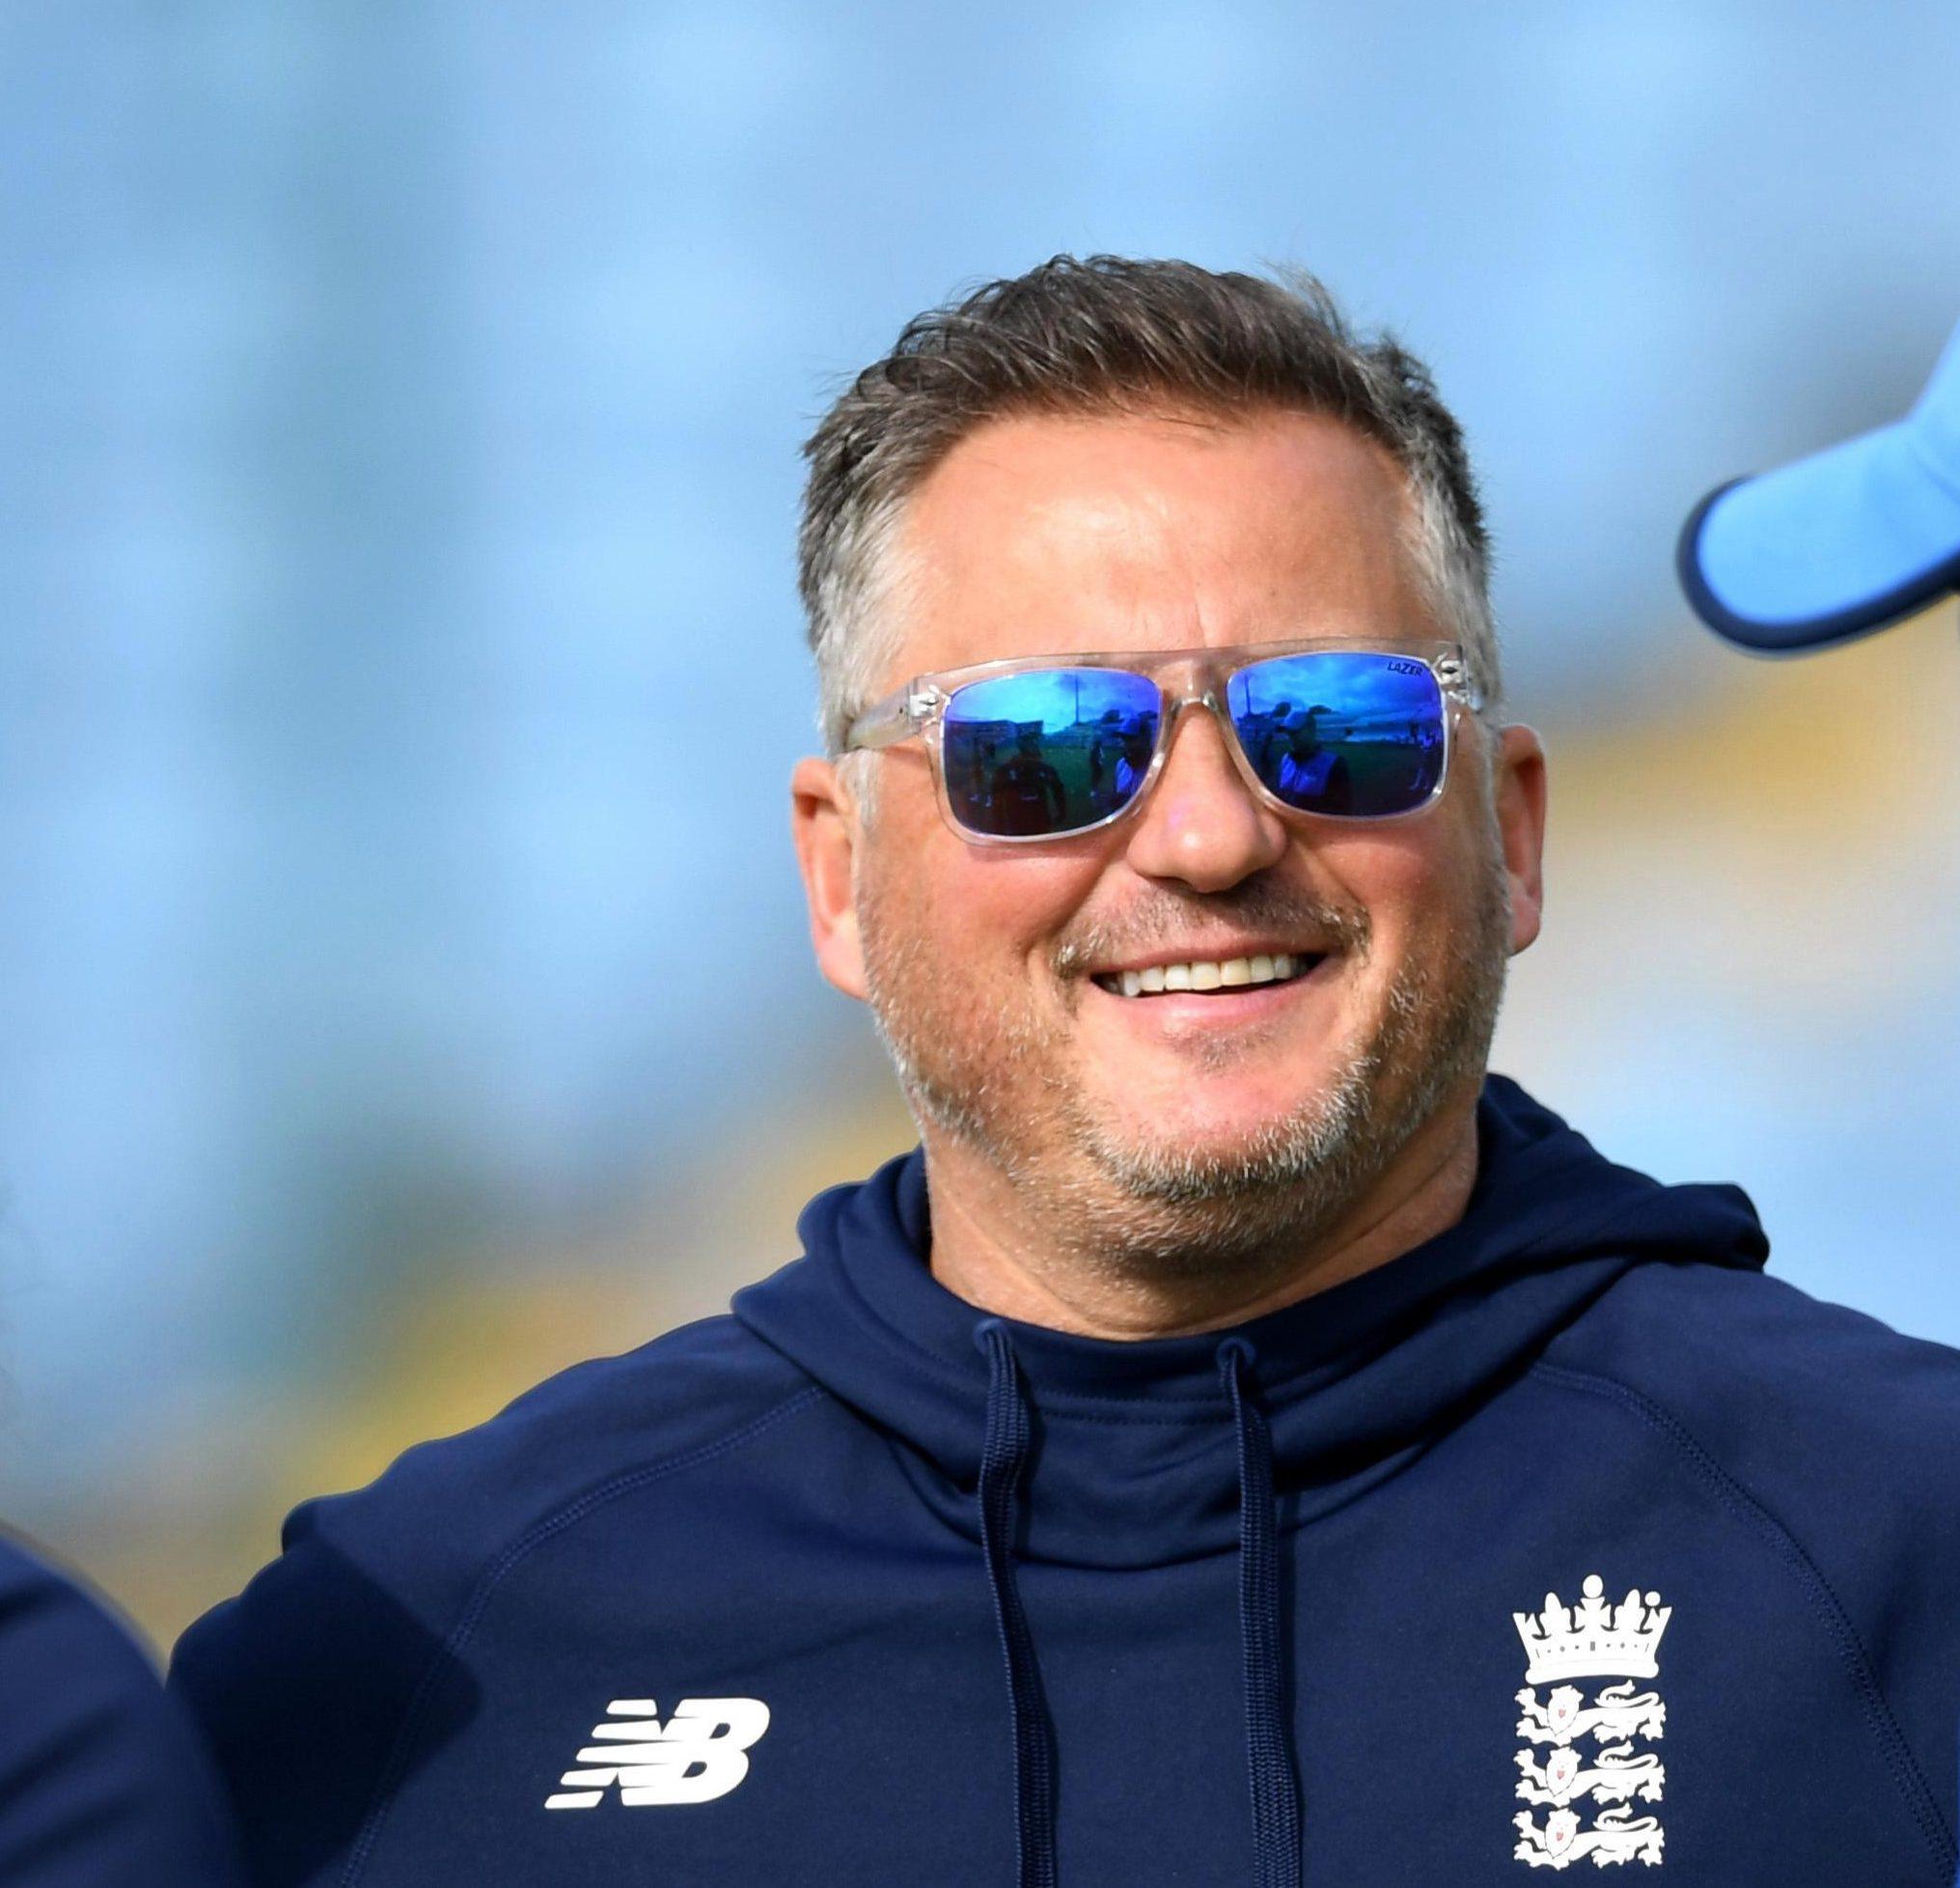 Darren Gough has taken aim at England coach Trevor Bayliss